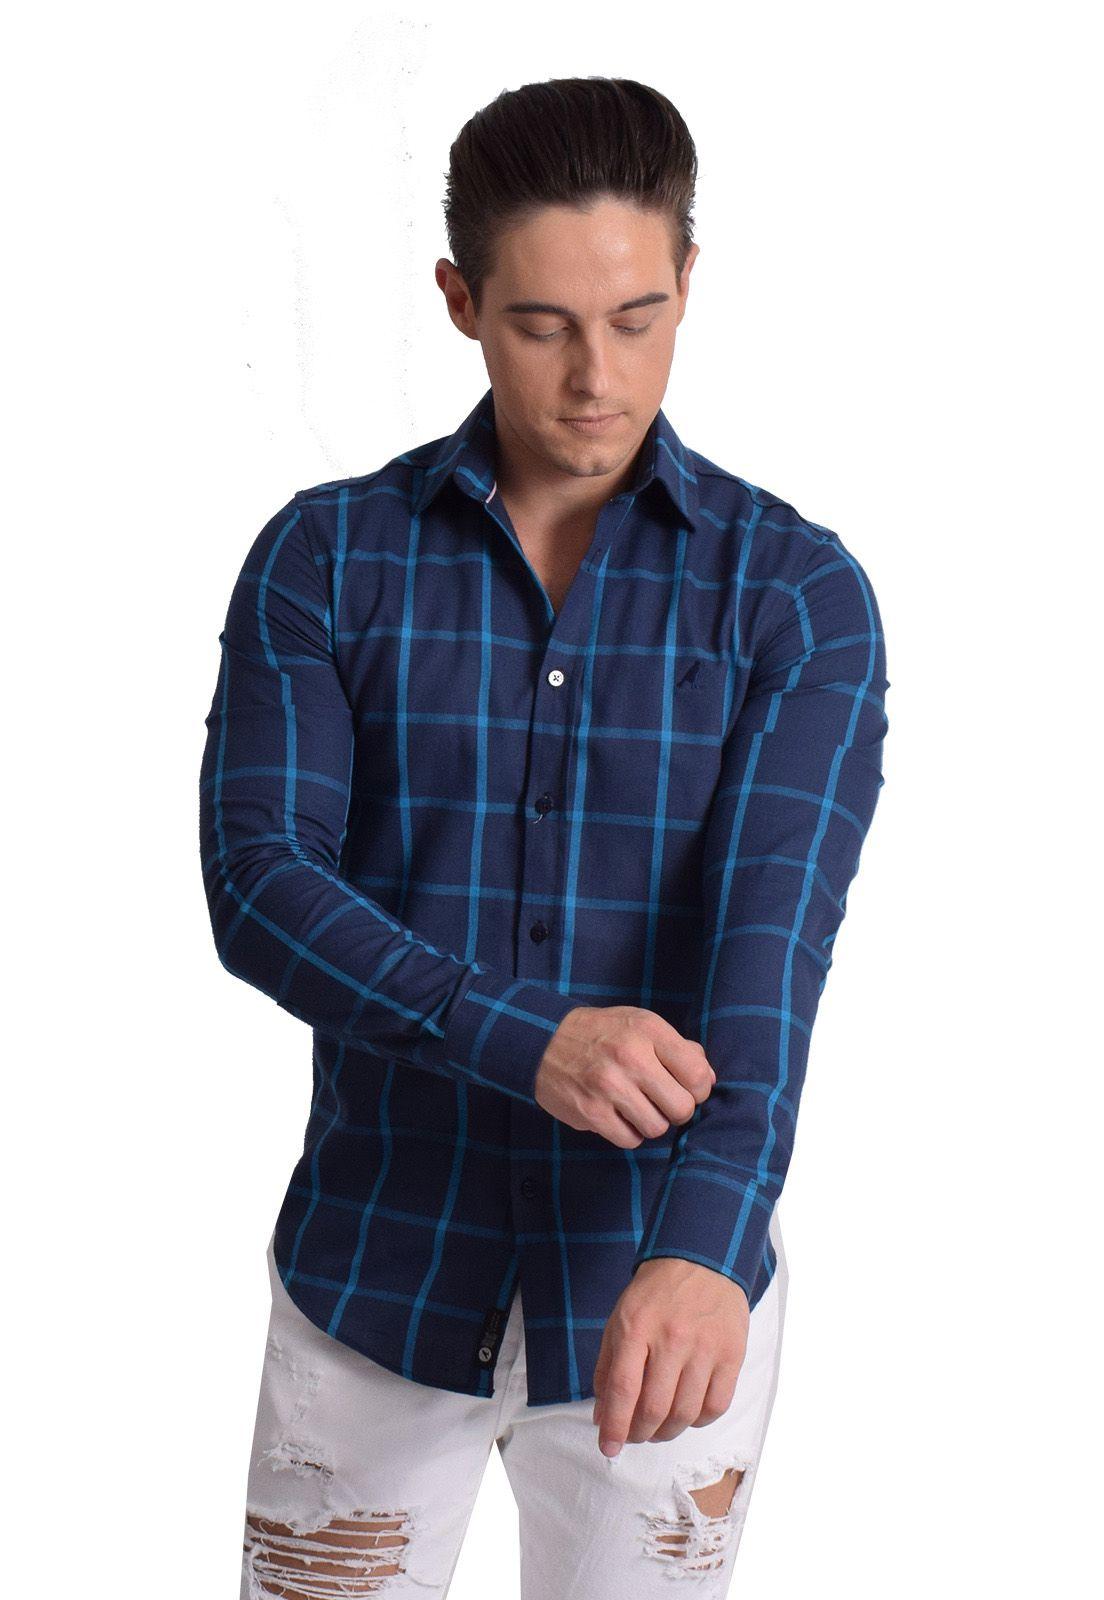 100241 - Camisa Social Masculina Slim Xadrez Azul - LEVOK